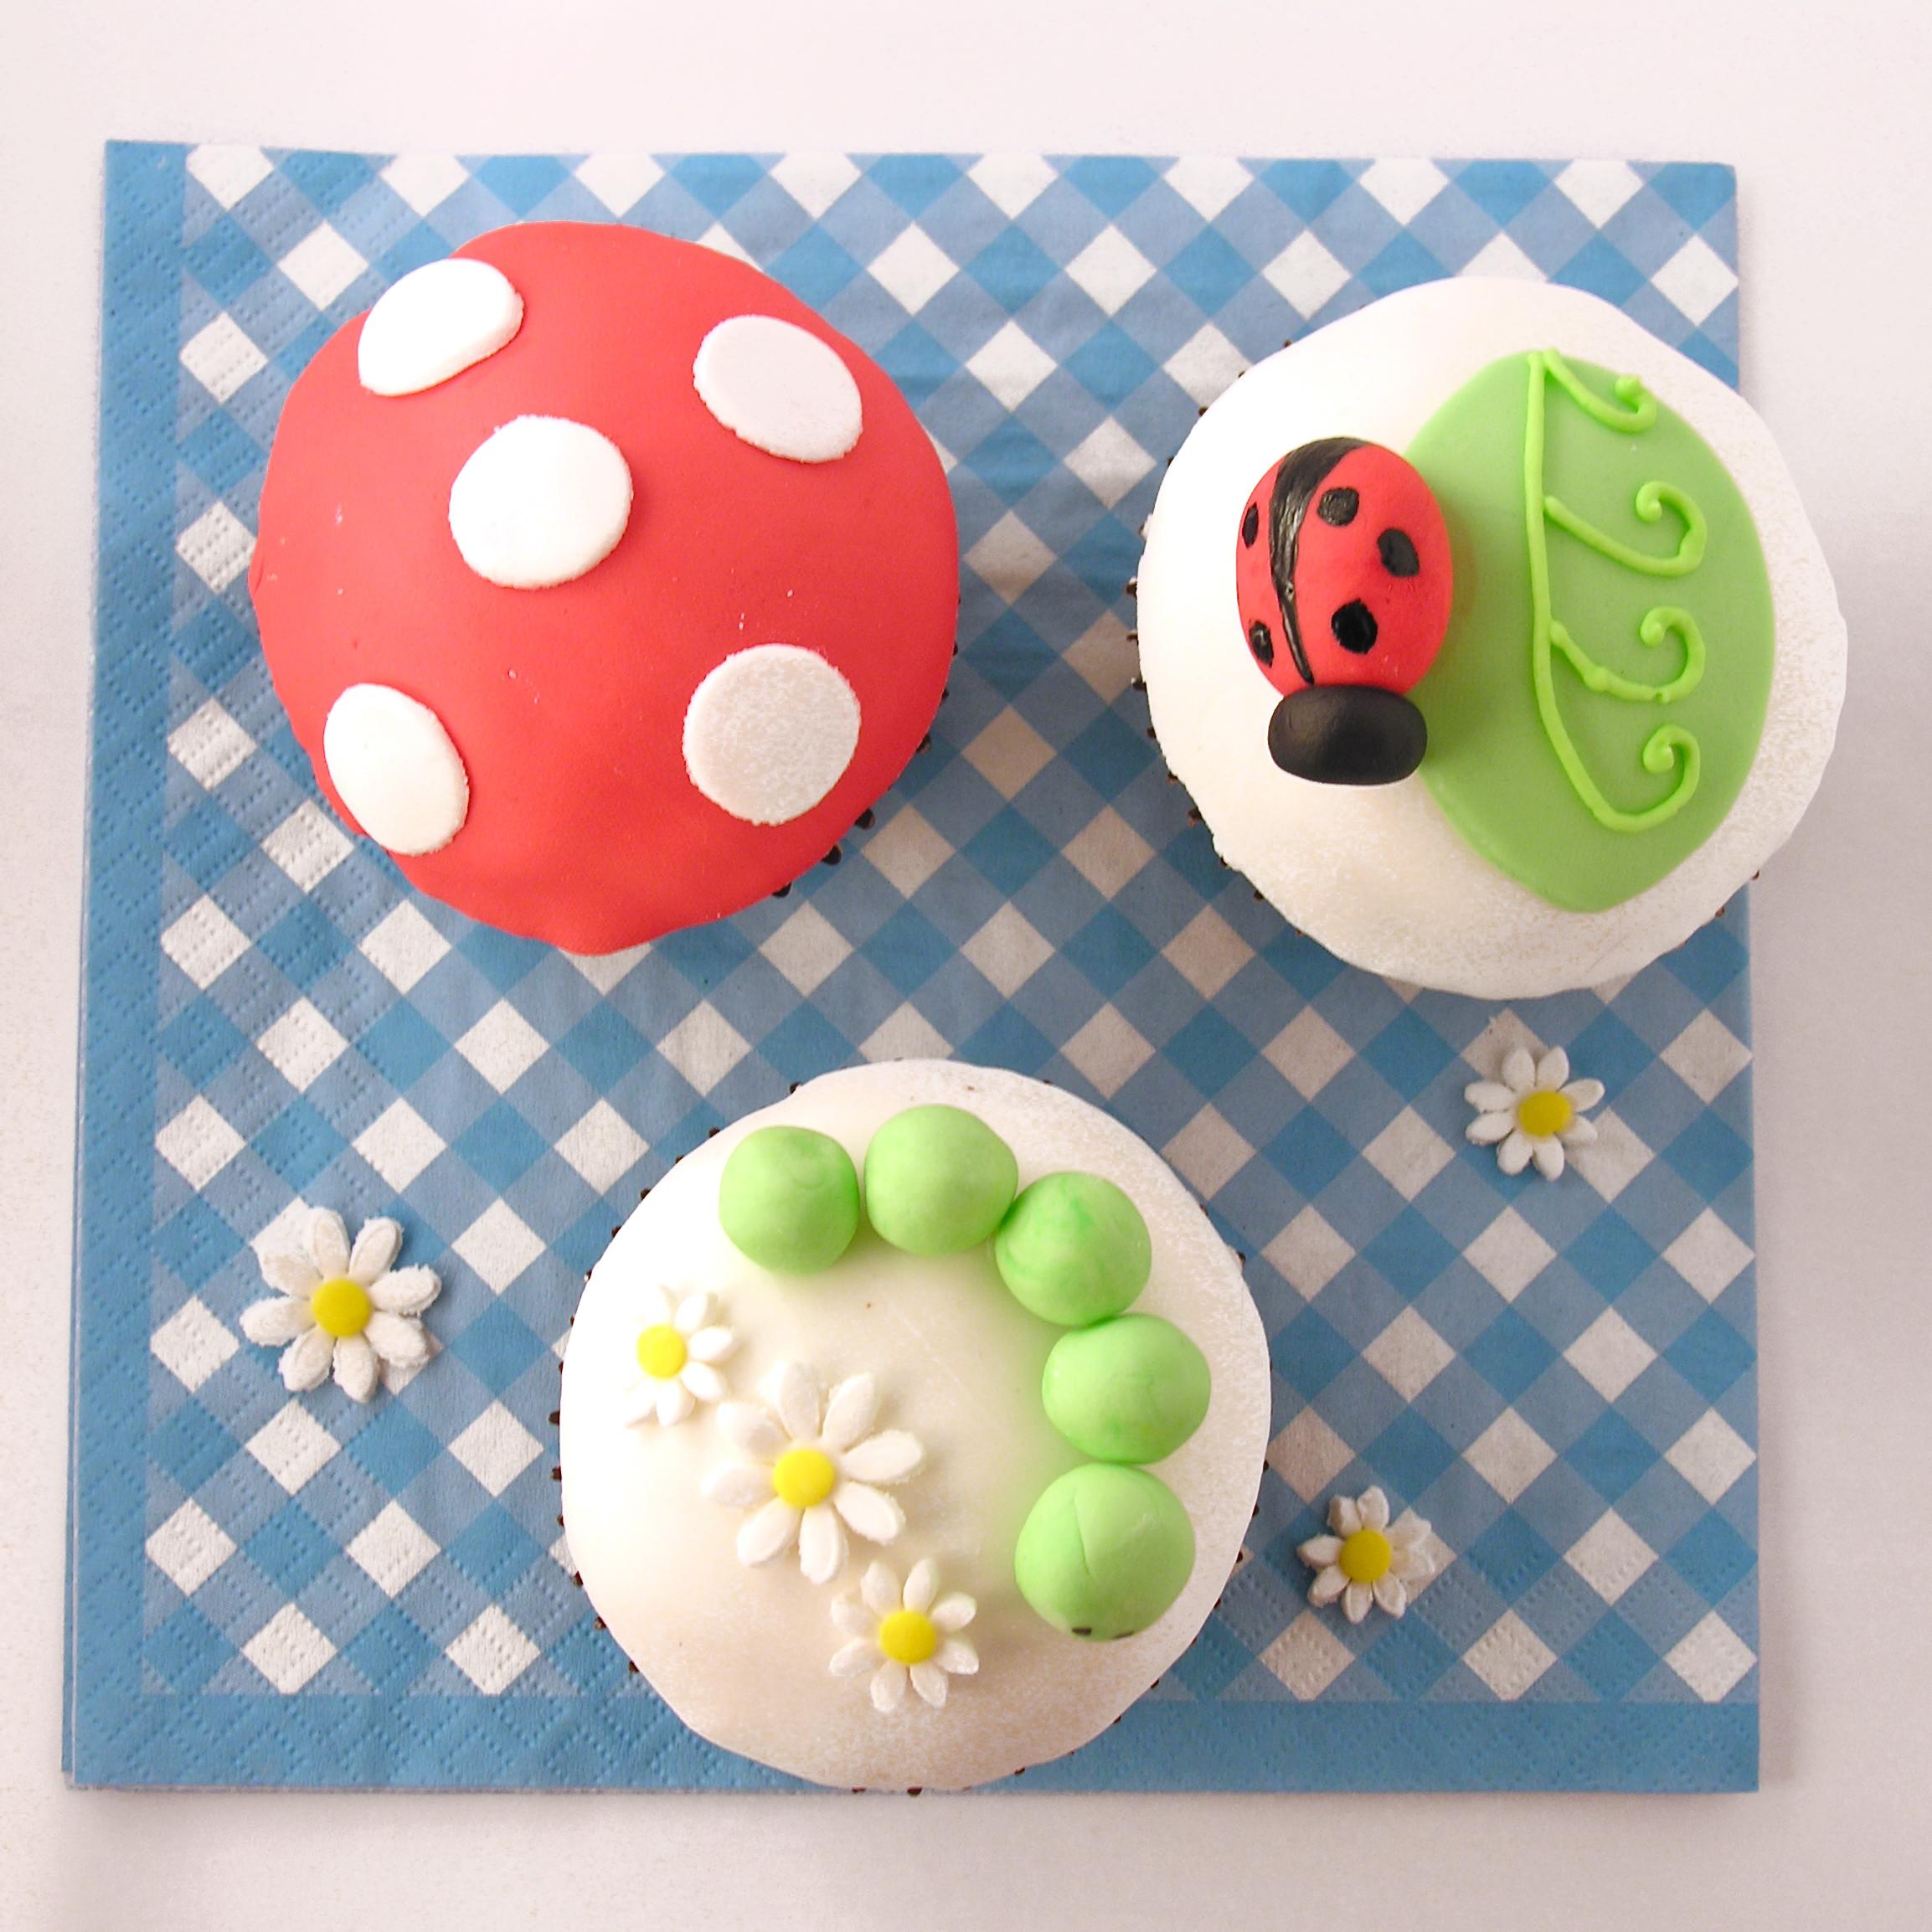 Cake Designs Using Cupcakes - Ladybug and caterpillar cupcakes